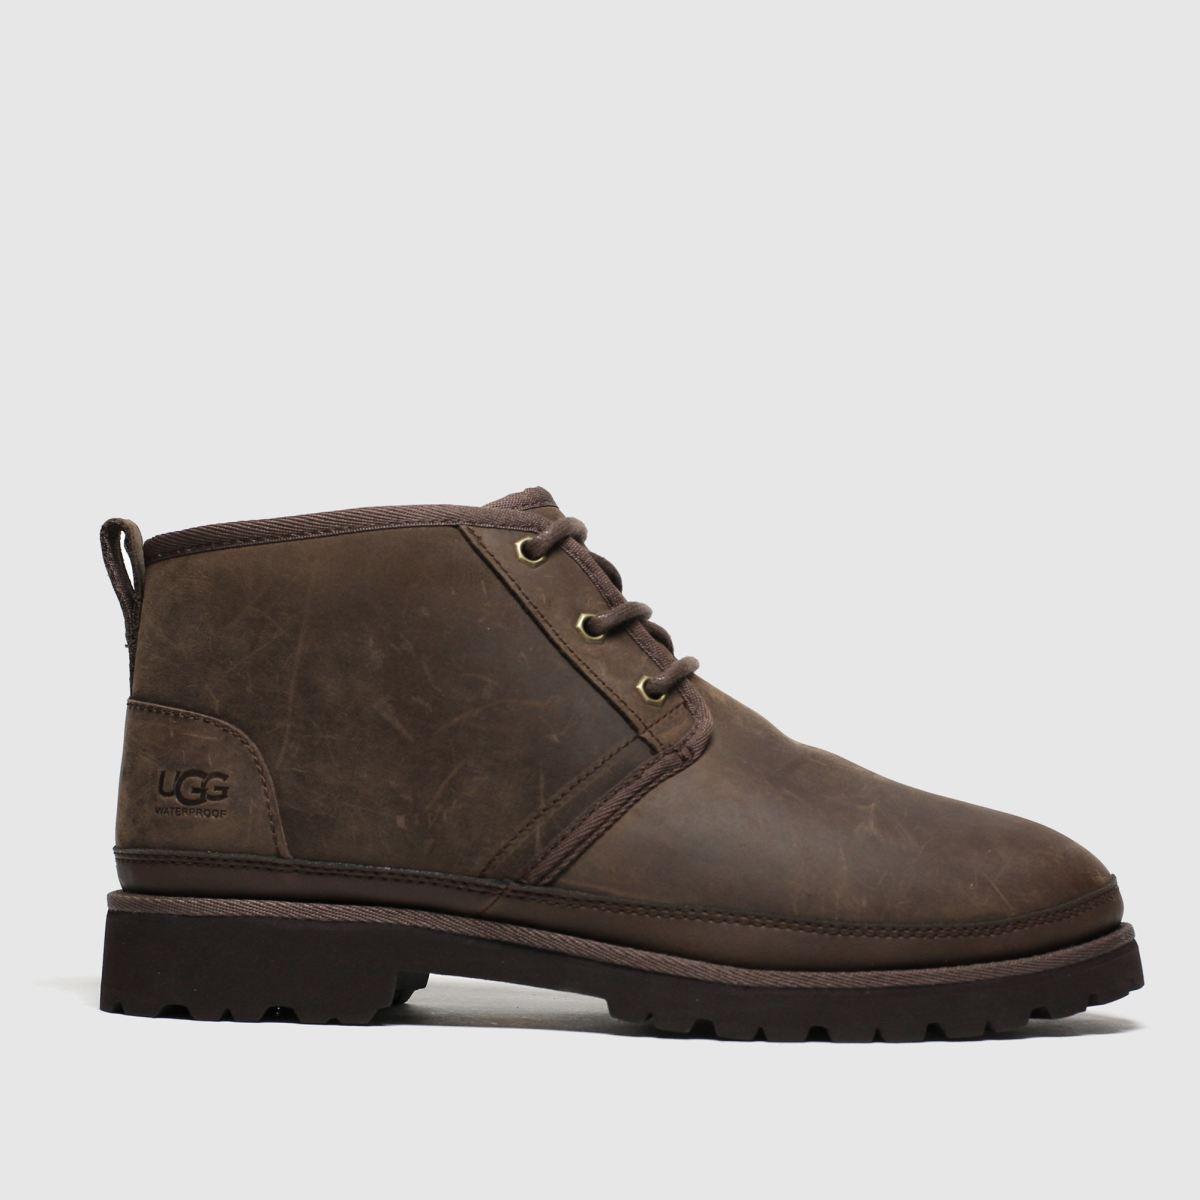 Ugg Brown Neuland Boots